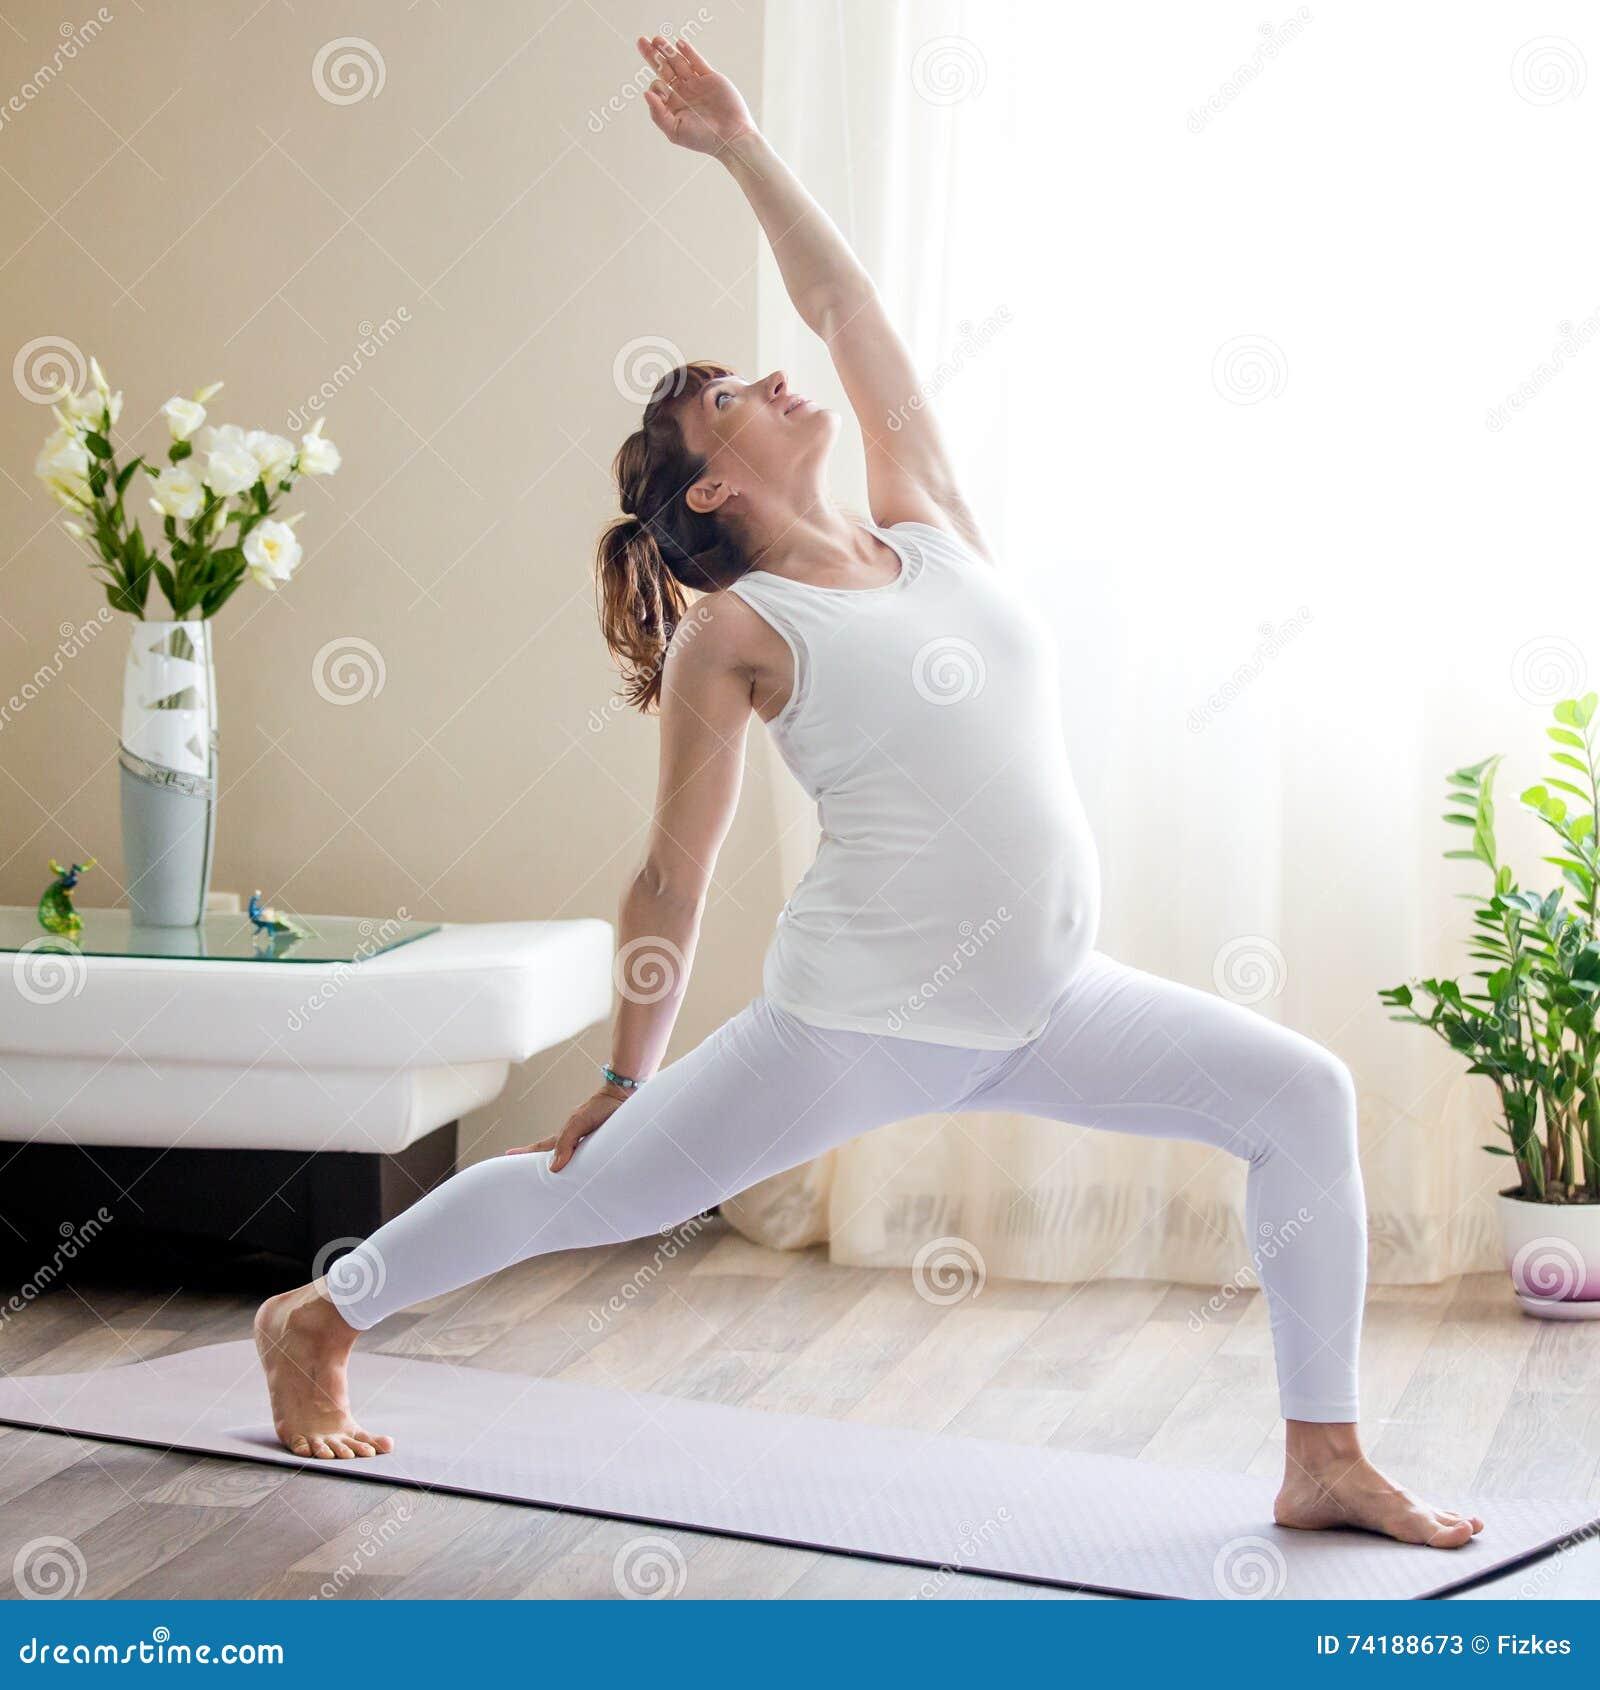 Pregnant Woman Doing Viparita Virabhadrasana Yoga Pose At ...